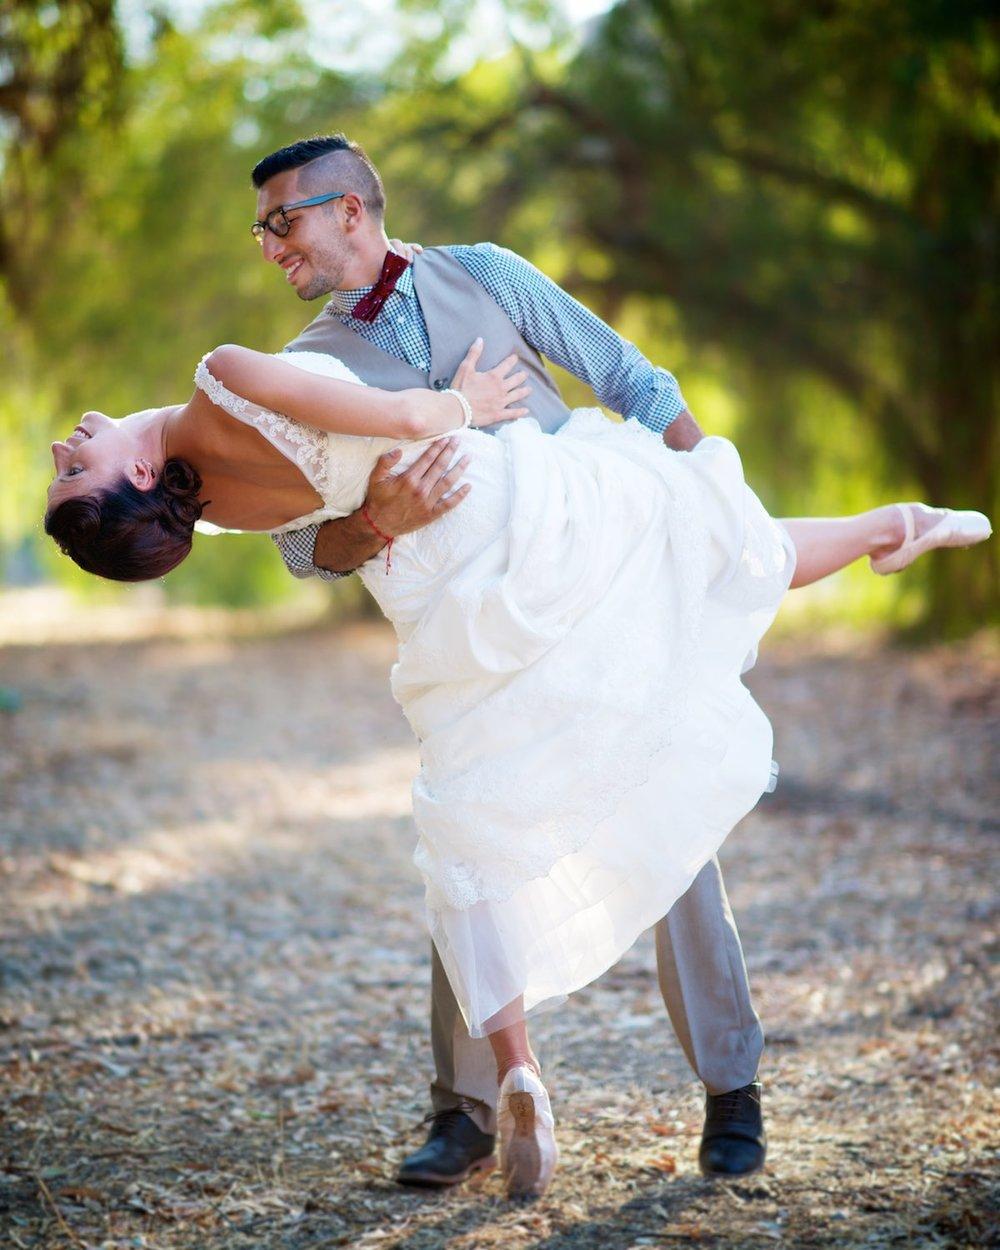 anta-ana-wedding-michal-pfeil-31.jpg